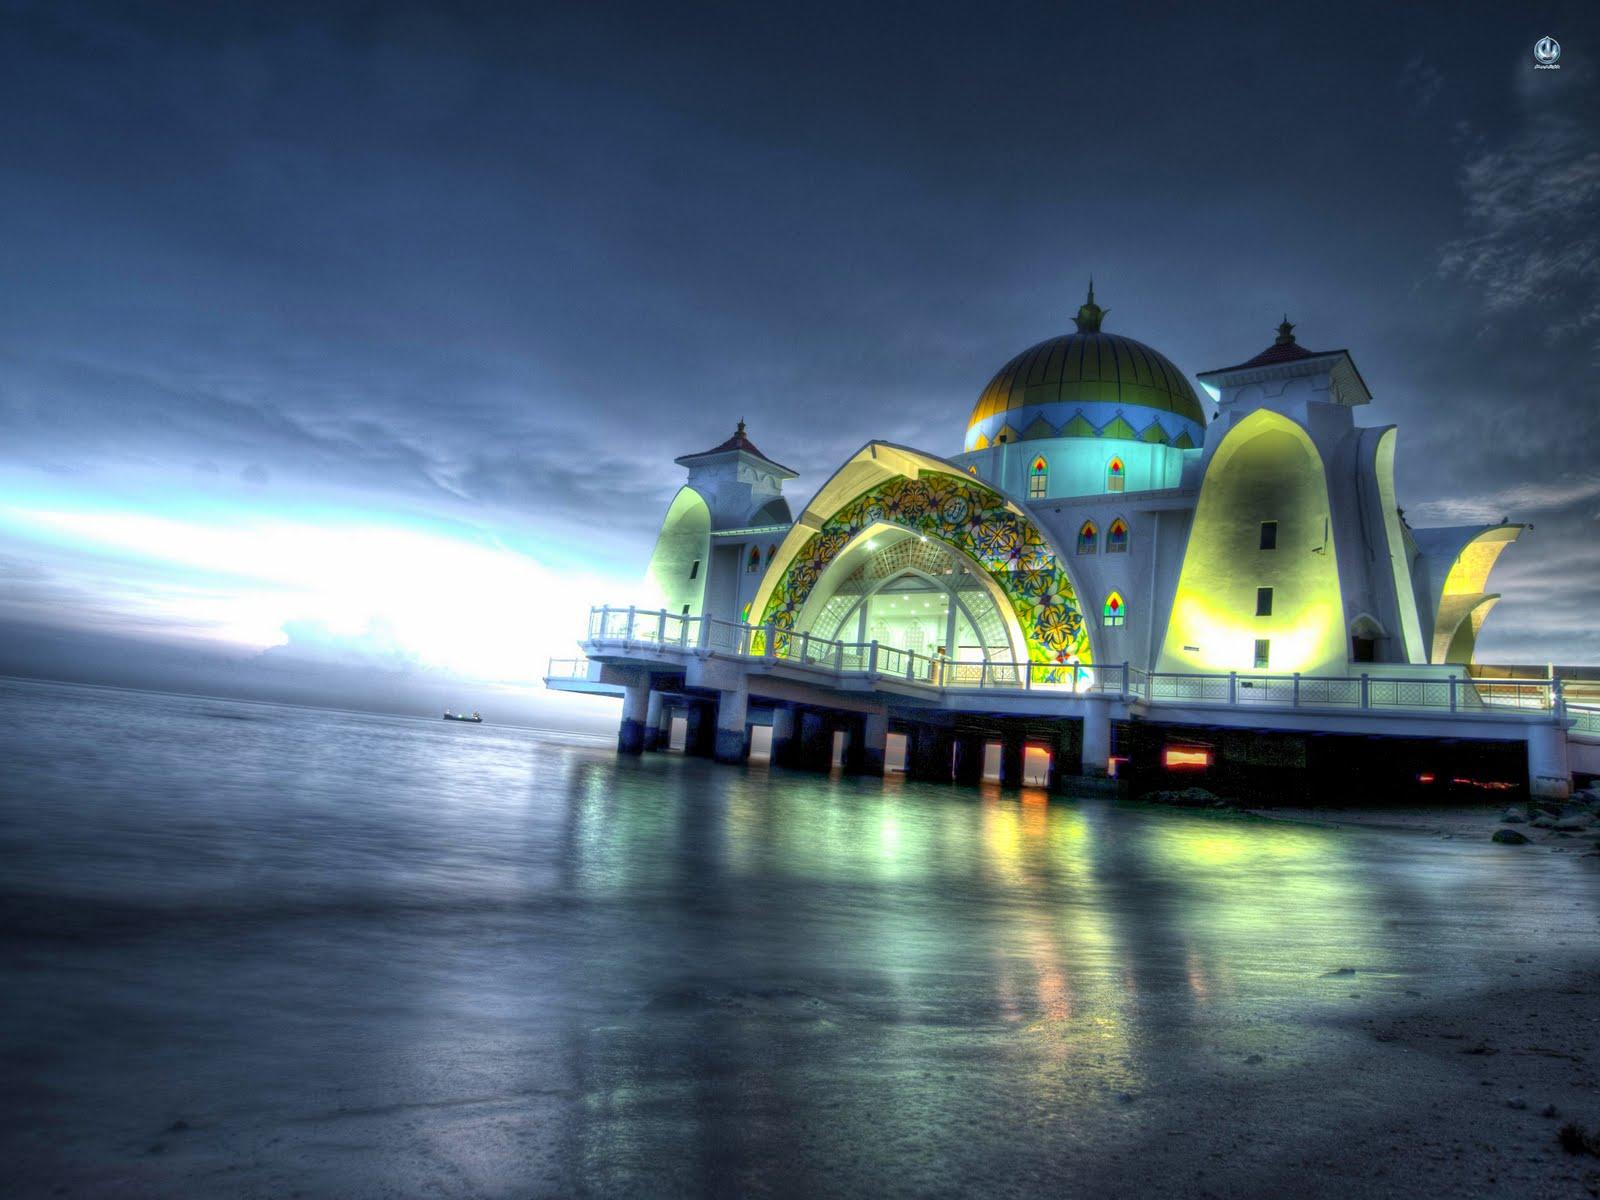 Masjid-Selat-Melaka-pada-waktu-malam-Straits-of-Malacca-mosque-Malaysia-wallpaper-wp6004788